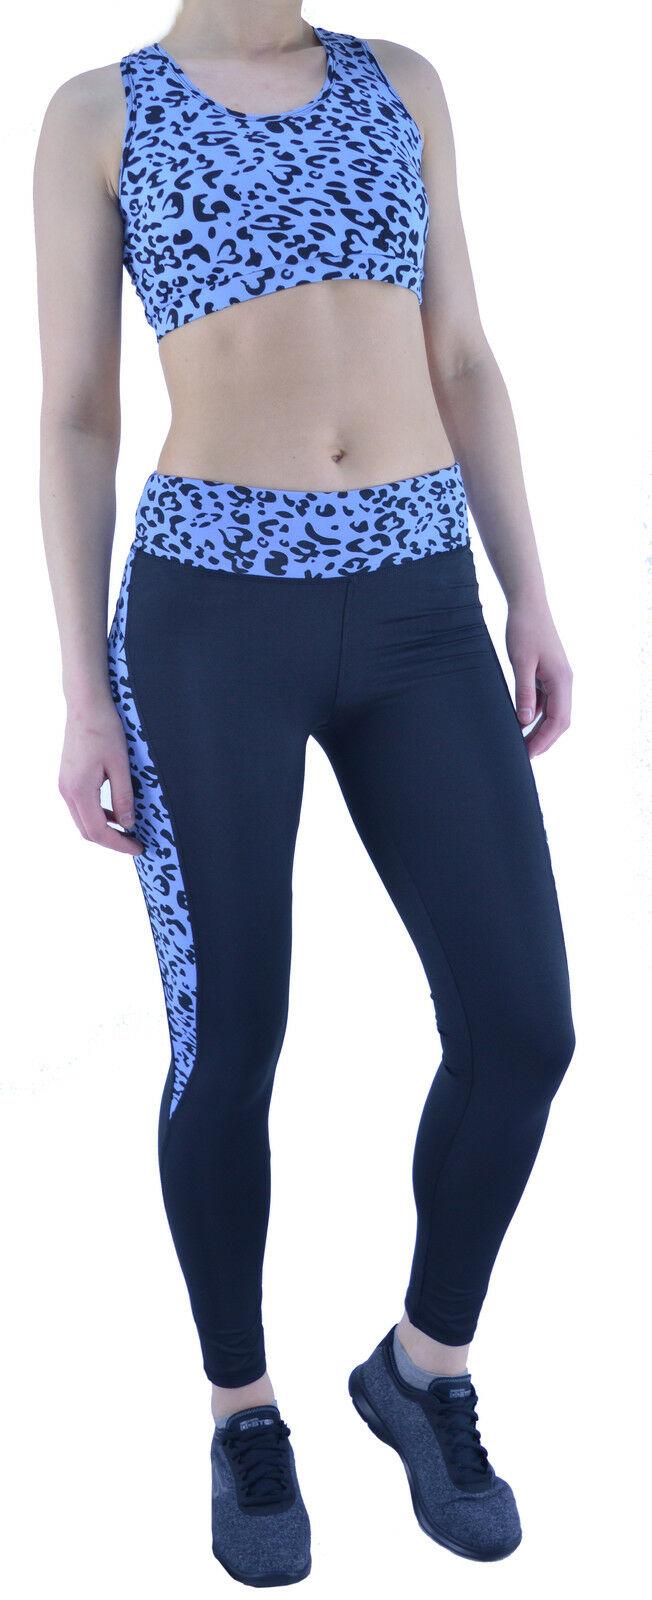 Activewear Leggings Yoga Pants Printed Mid Waist XS (UK 8) 99p / Sports Bra XS (UK 8) 99p delivered @ athletic_sportswear / ebay